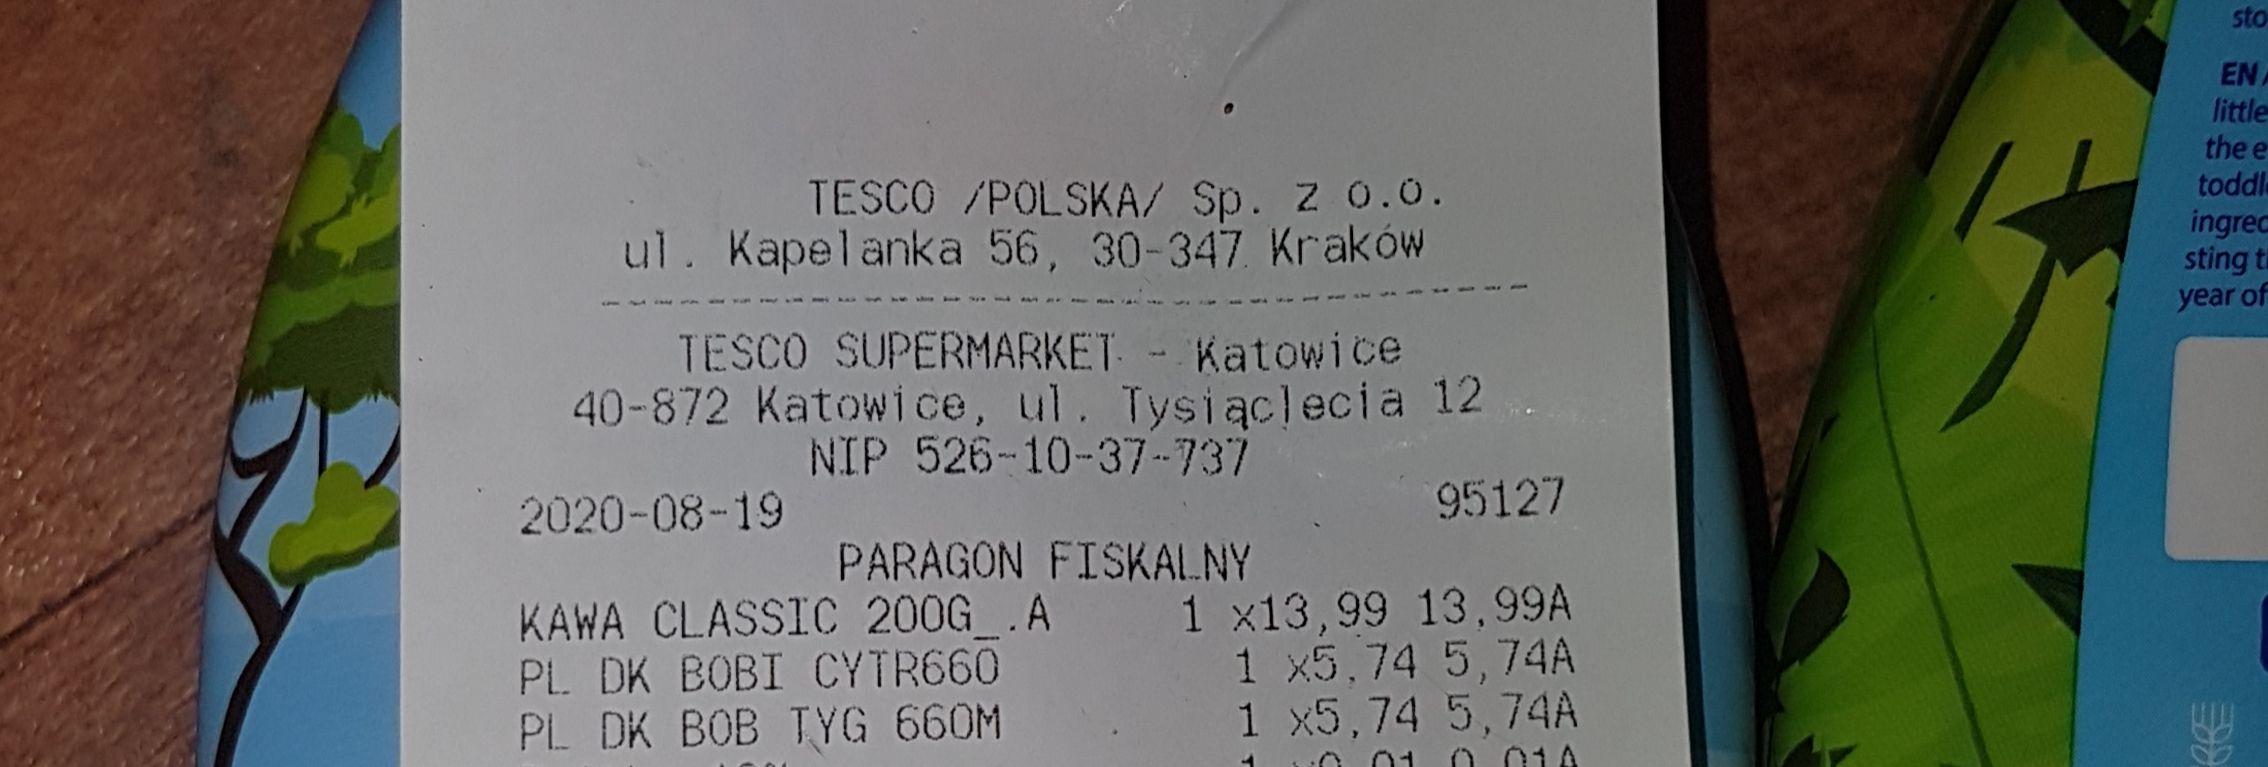 291184-S0kVC.jpg